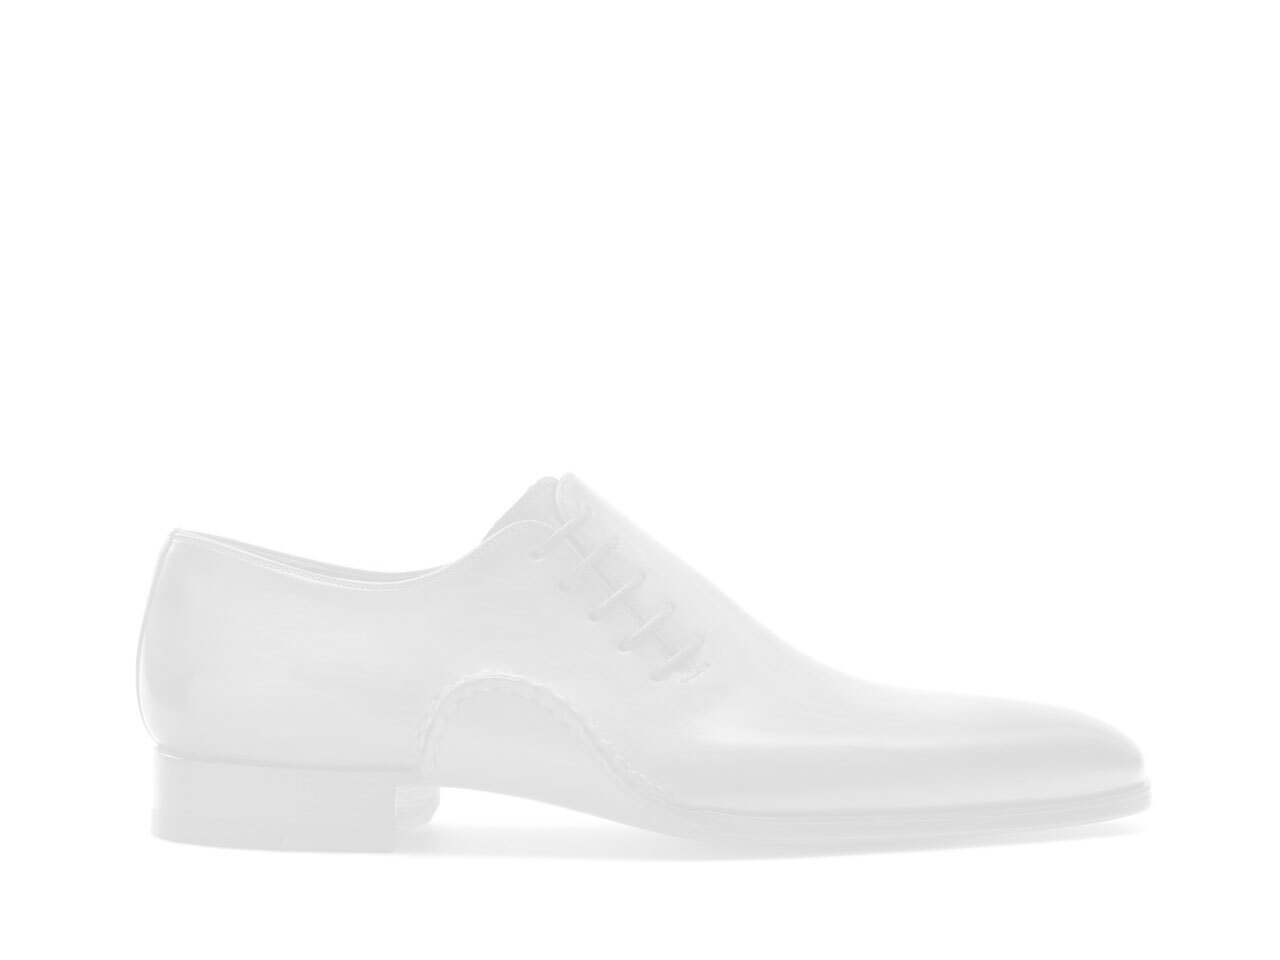 Pair of the Magnanni Magnanni X Pelotonia Women's Sneakers